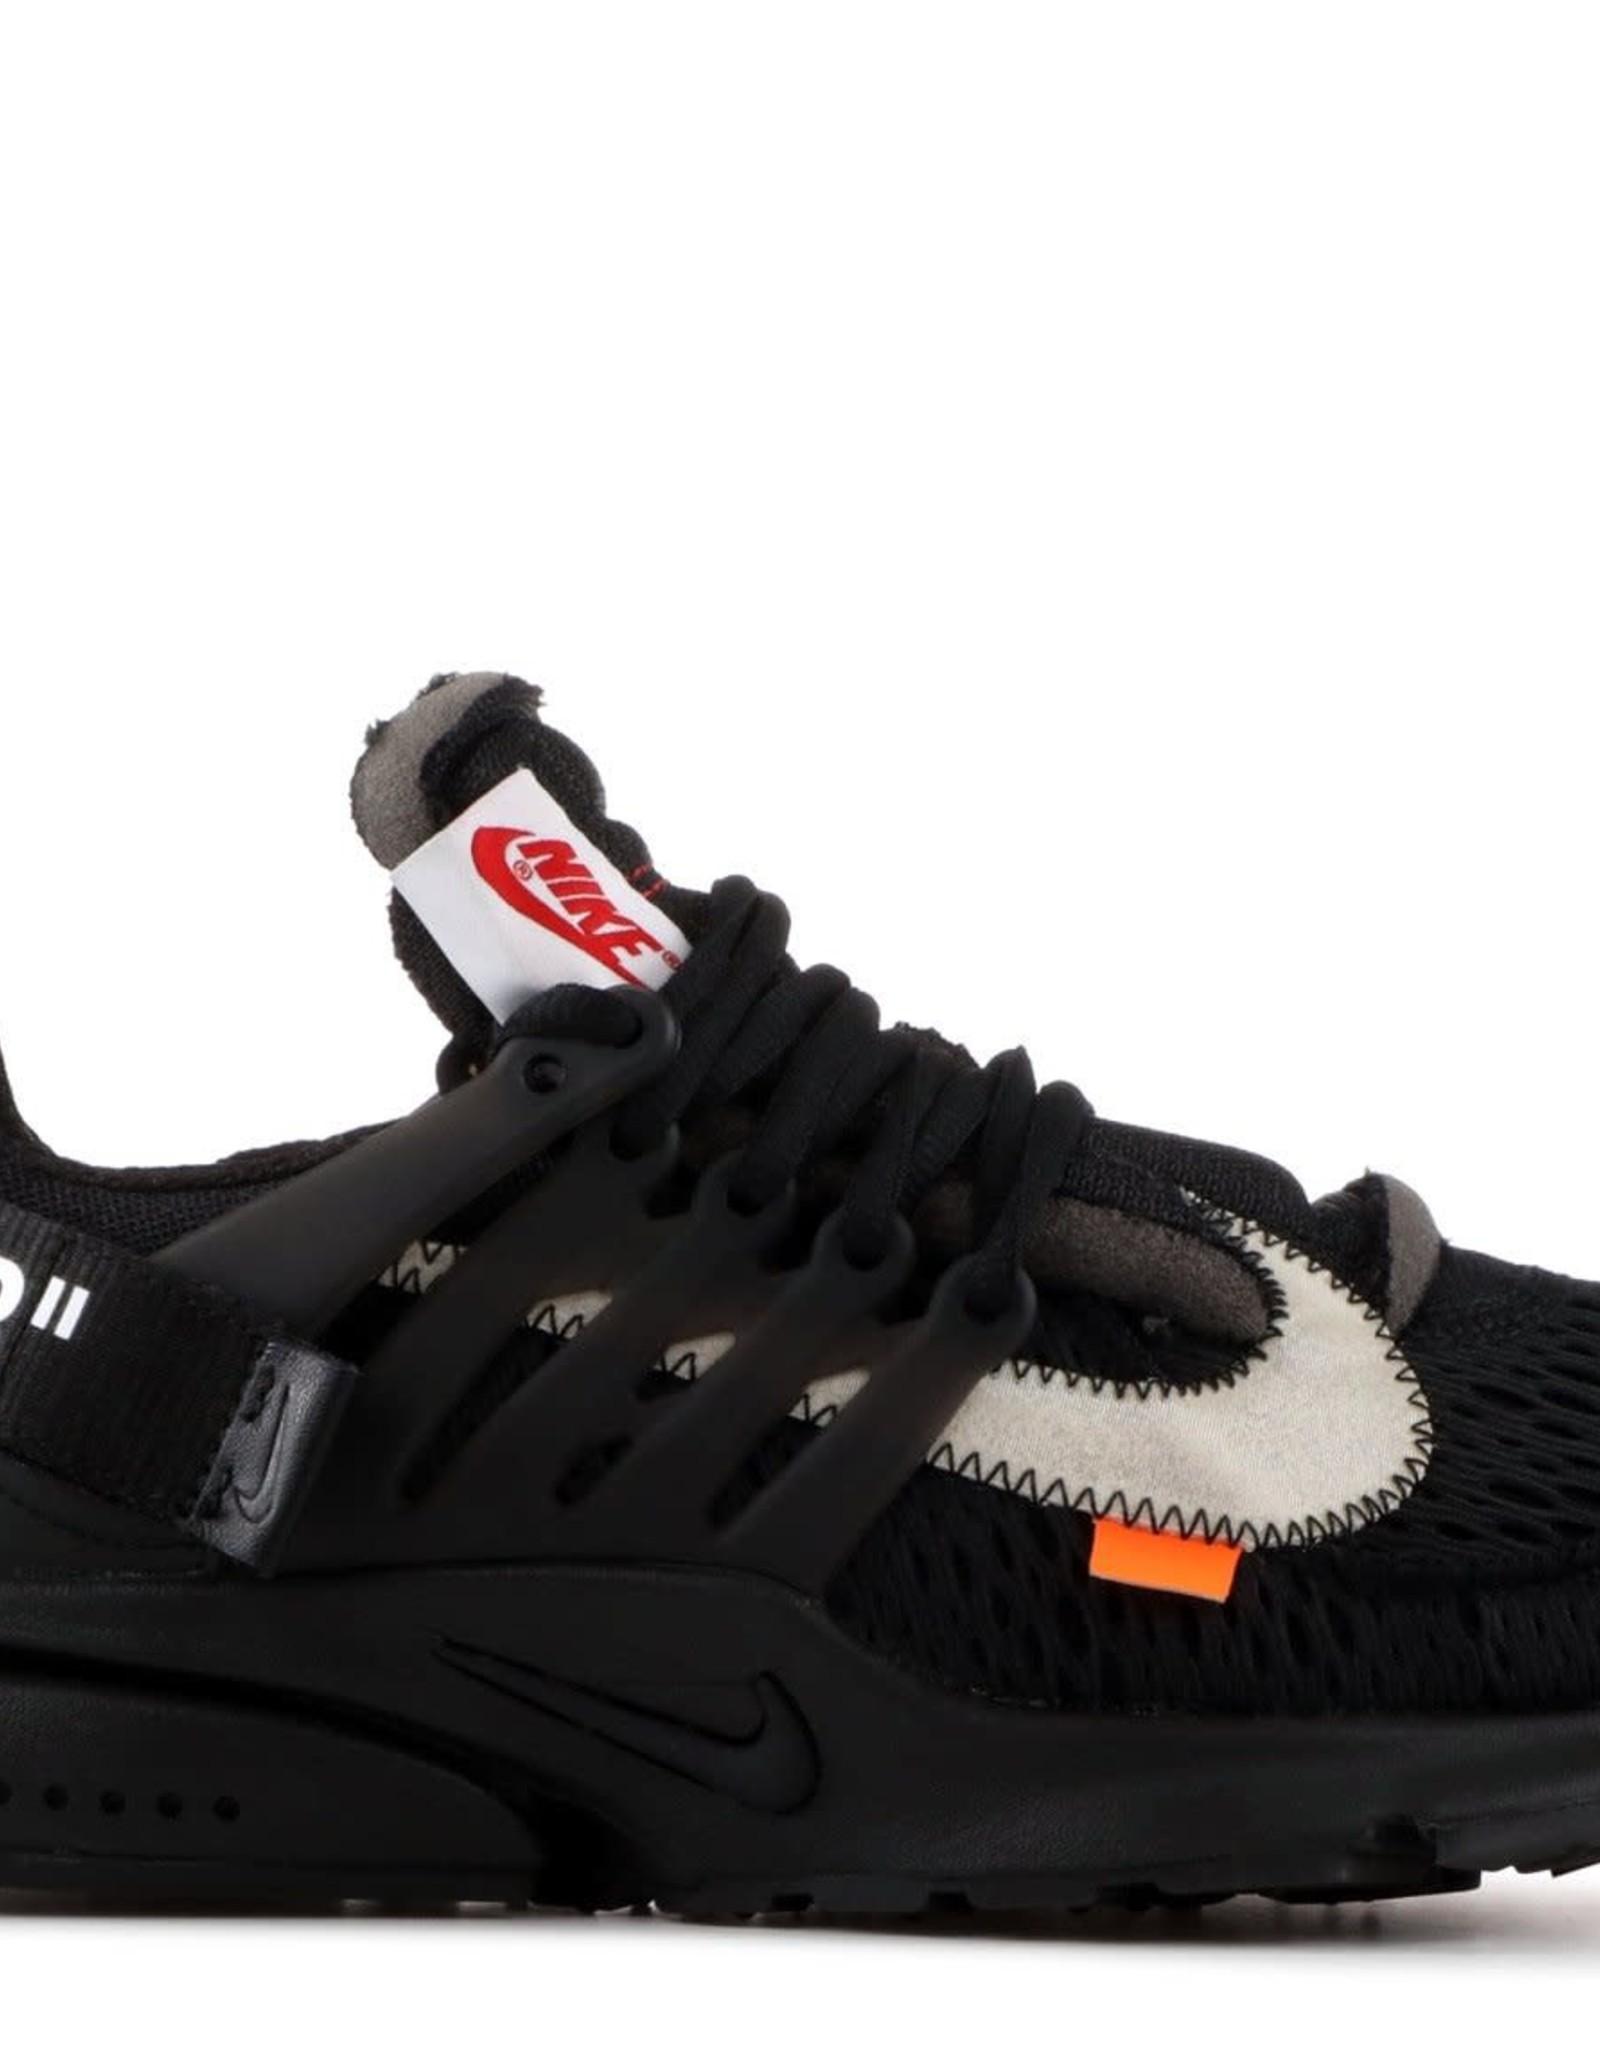 NIKE Nike Air Presto Off-White Black (2018)